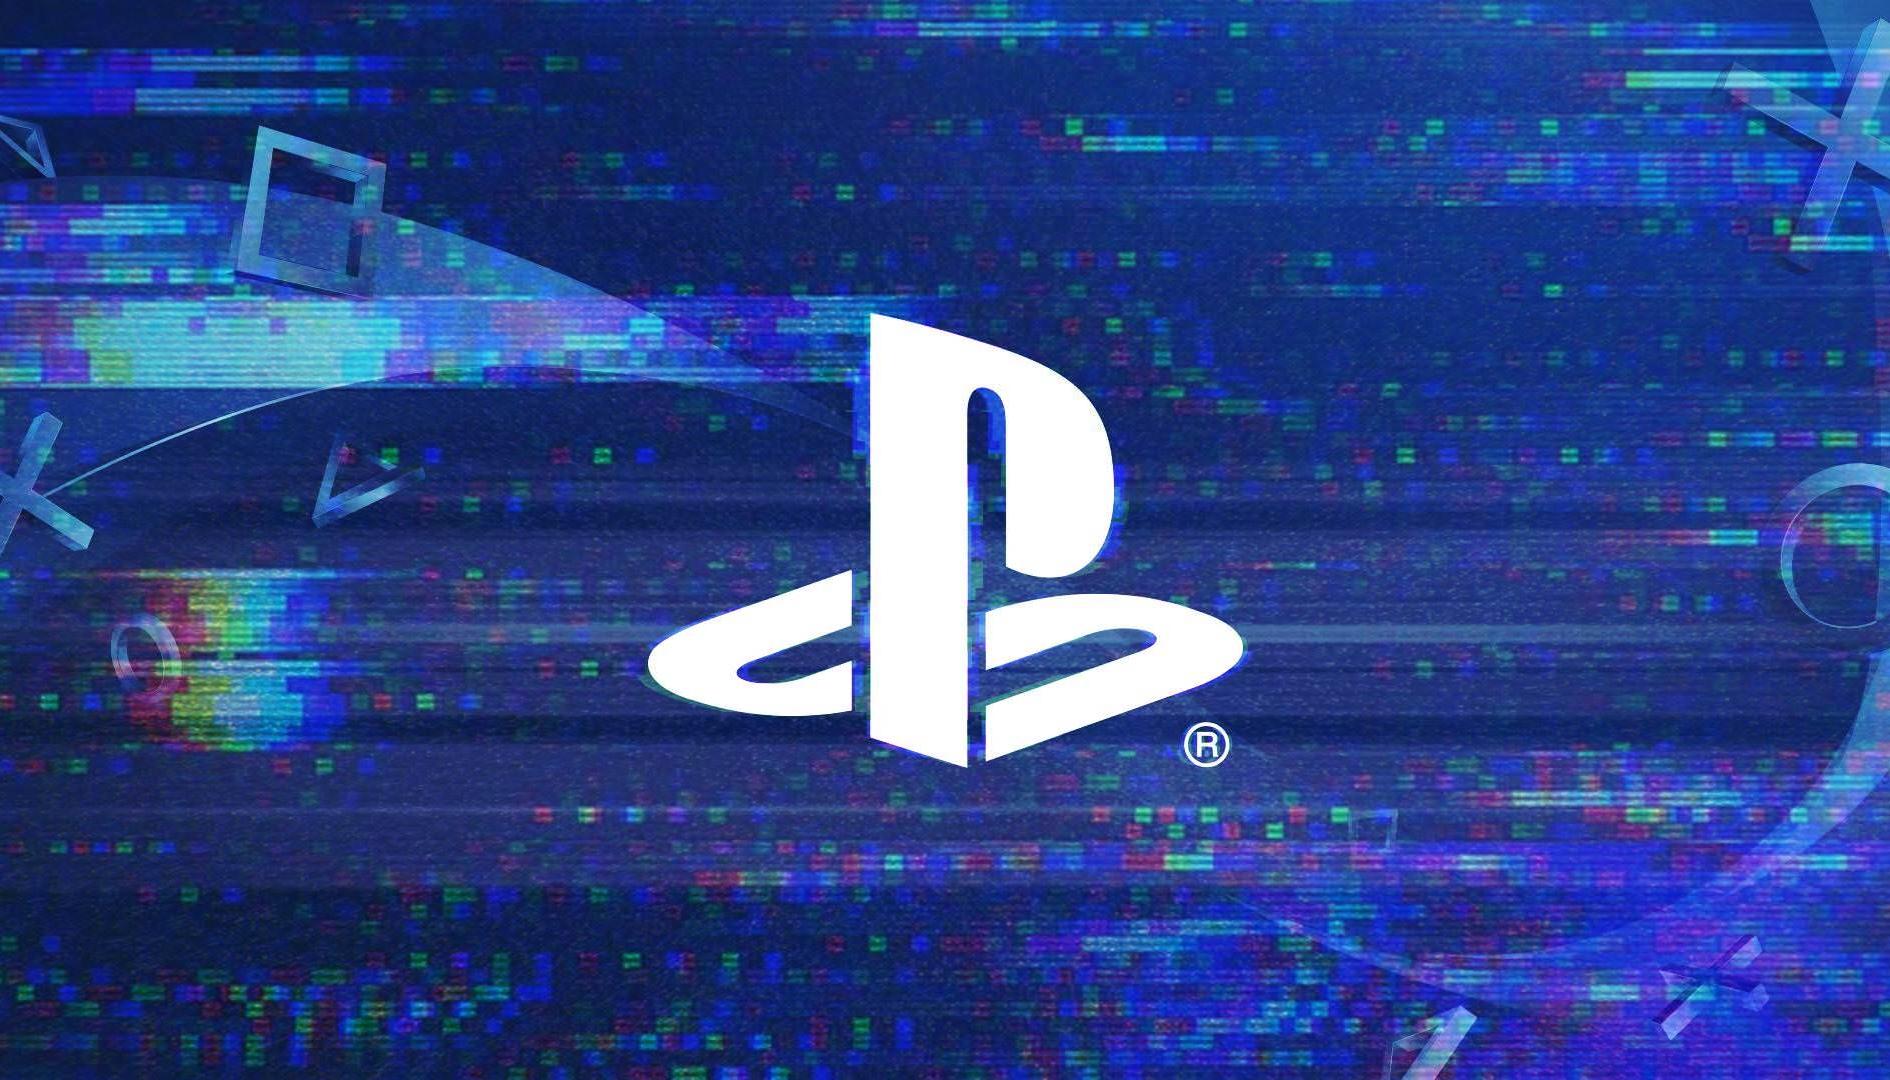 Guida come cambiare nickname su PlayStation